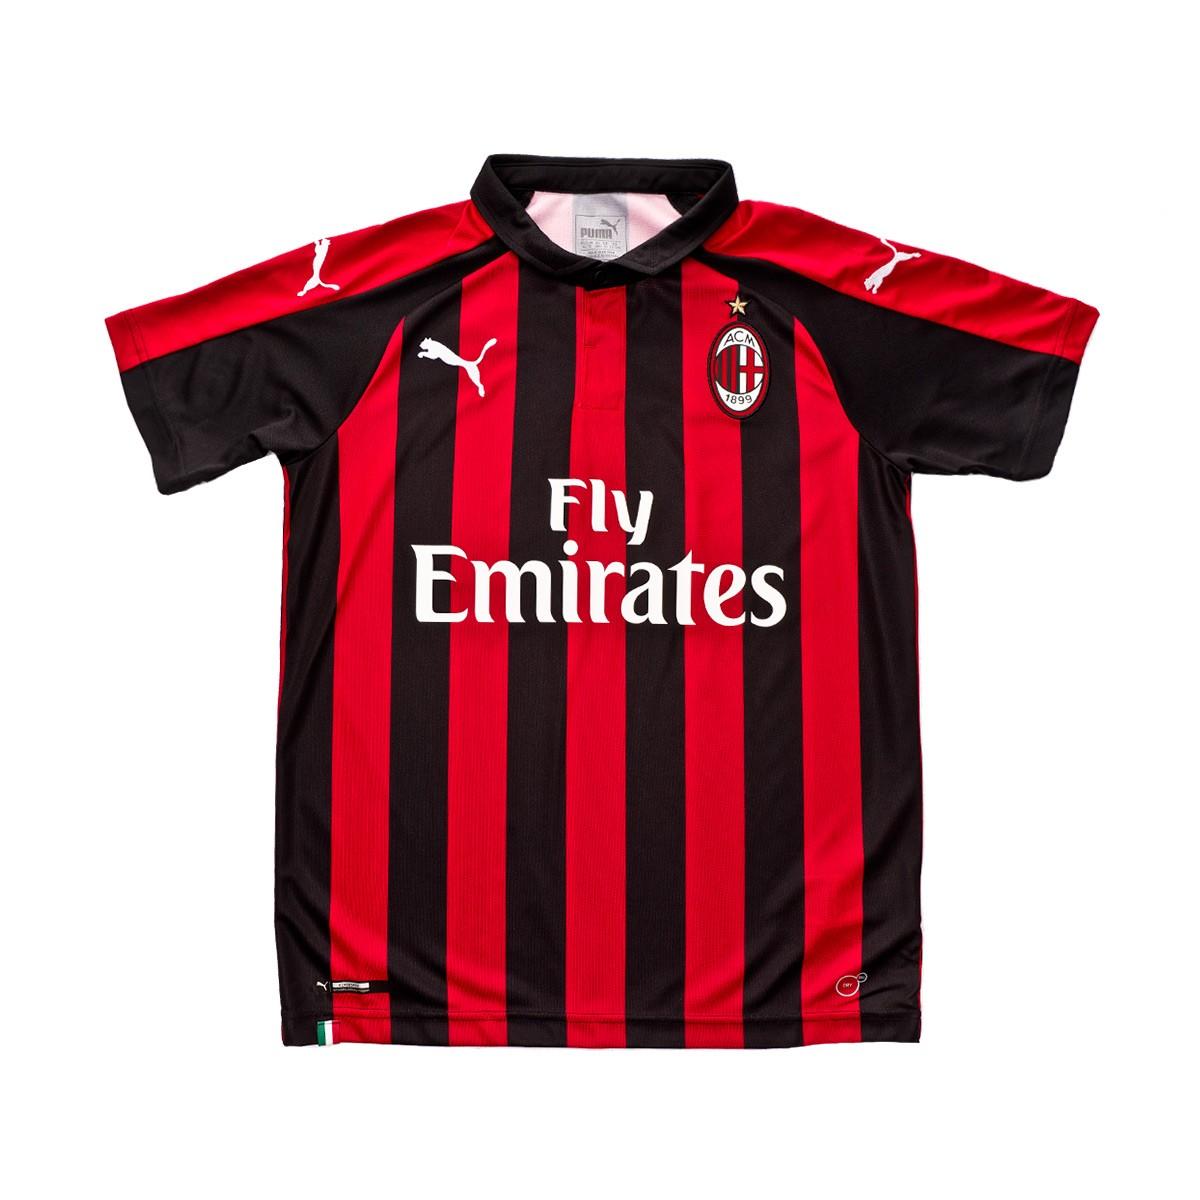 online store b3b2c 1bac0 Camiseta AC Milan Primera Equipación 2018-2019 Niño Chili pepper-Puma black